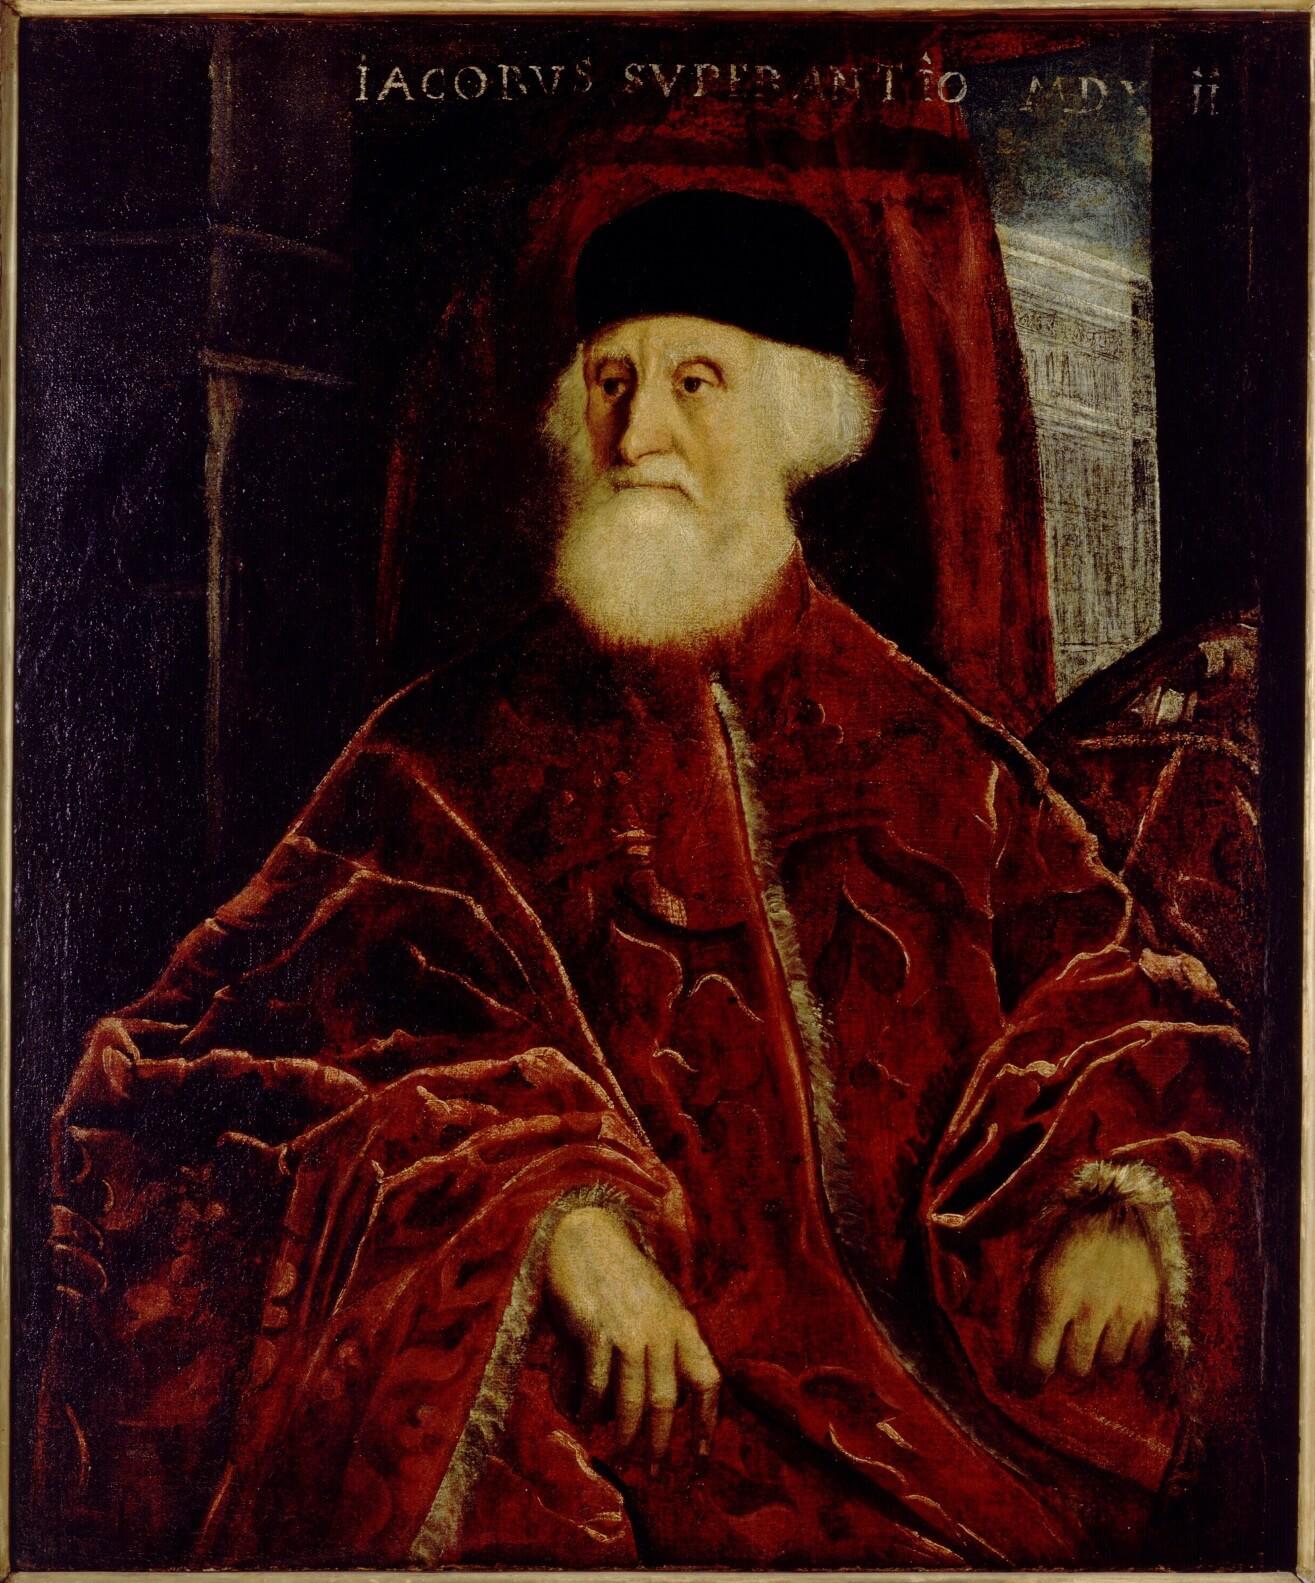 Tintoretto (Jacopo Robusti) Venetië 1519 – 1594 Venetië), Portret van procurator Jacopo Soranzo, ca. 1550, Galleria dell'Accademia in Venetië